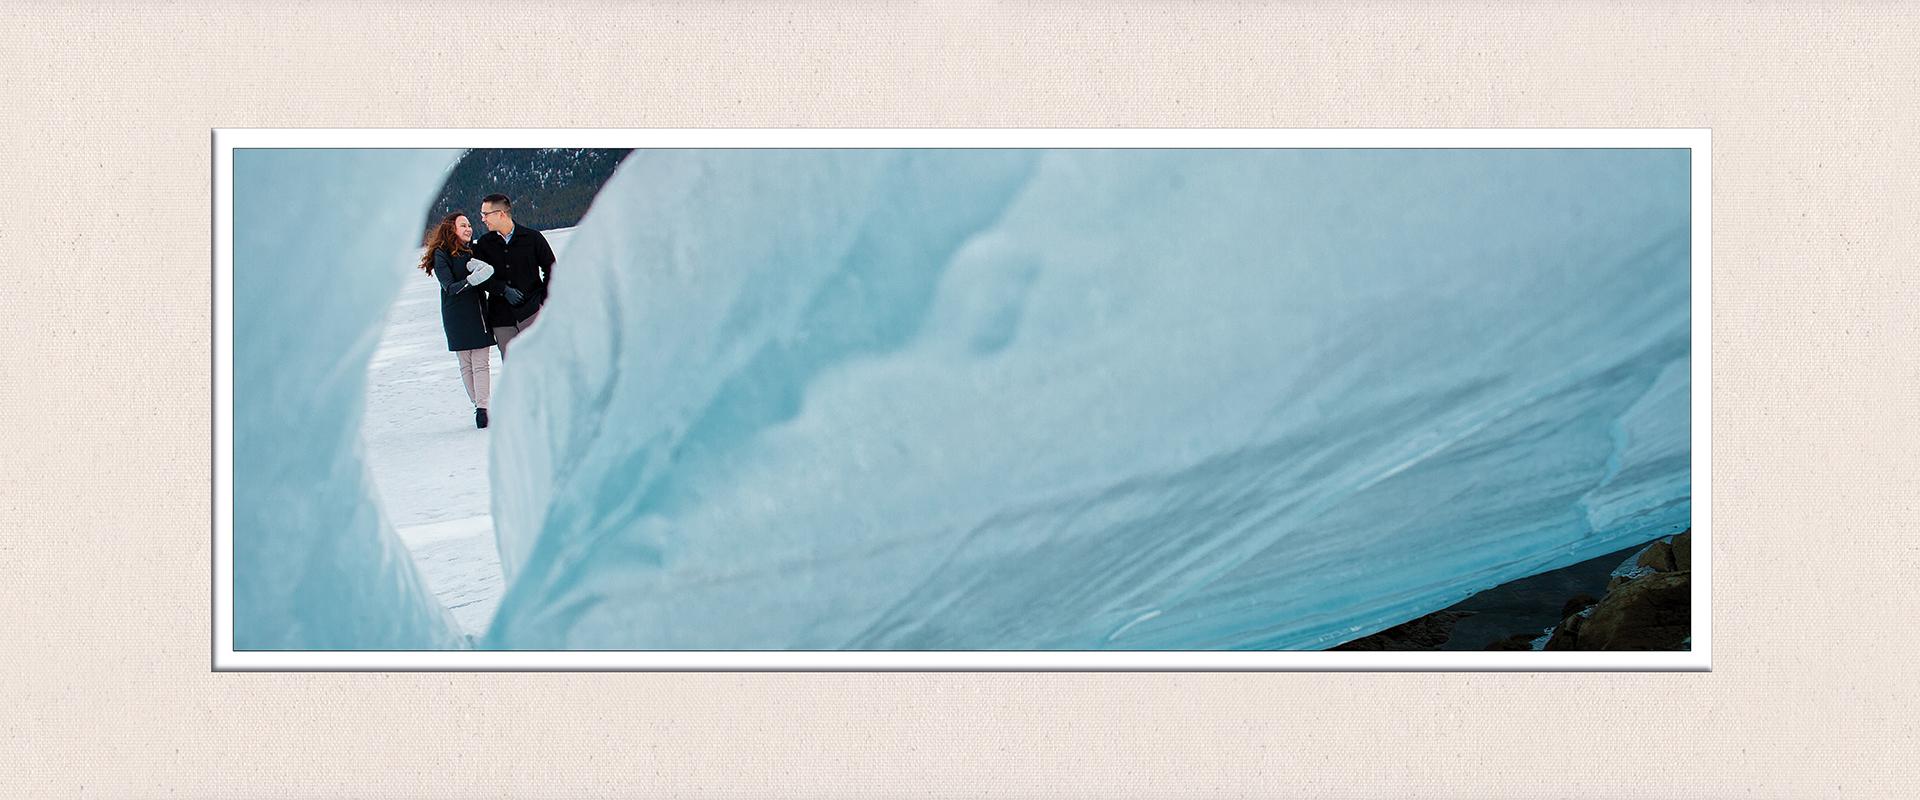 Seasons engagement album, winter :: Caitlyn + Jordan pages 15-16